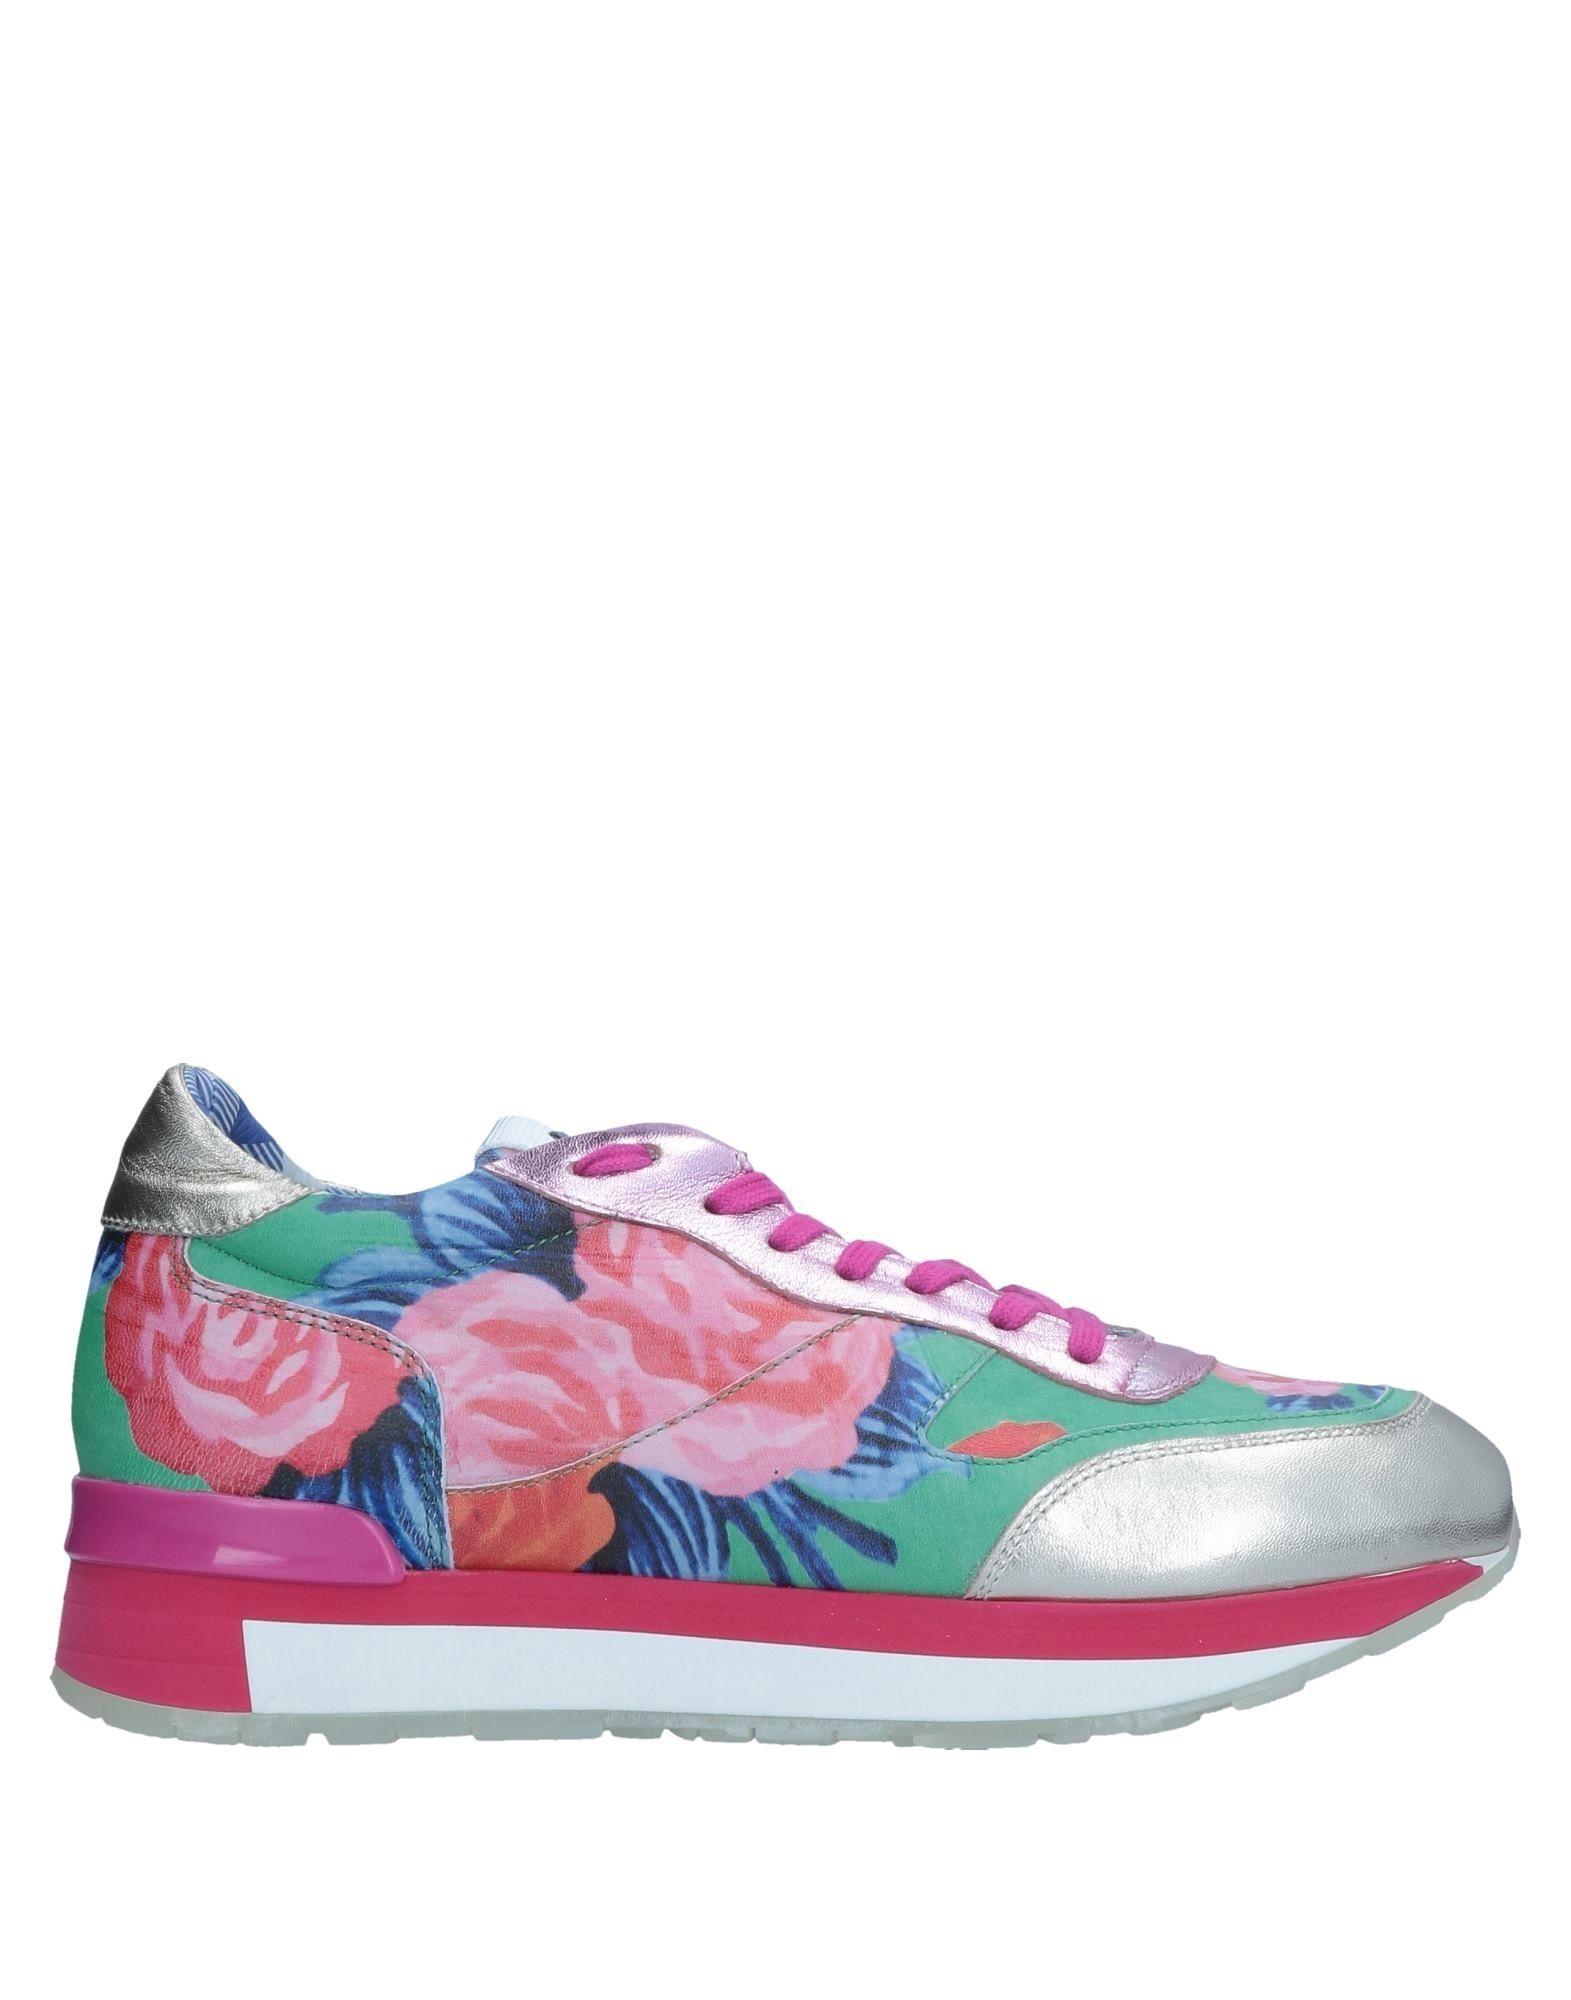 Twin-Set Simona Barbieri Sneakers - Women Twin-Set Simona Barbieri Sneakers - online on  Canada - Sneakers 11547936ON 6355f6